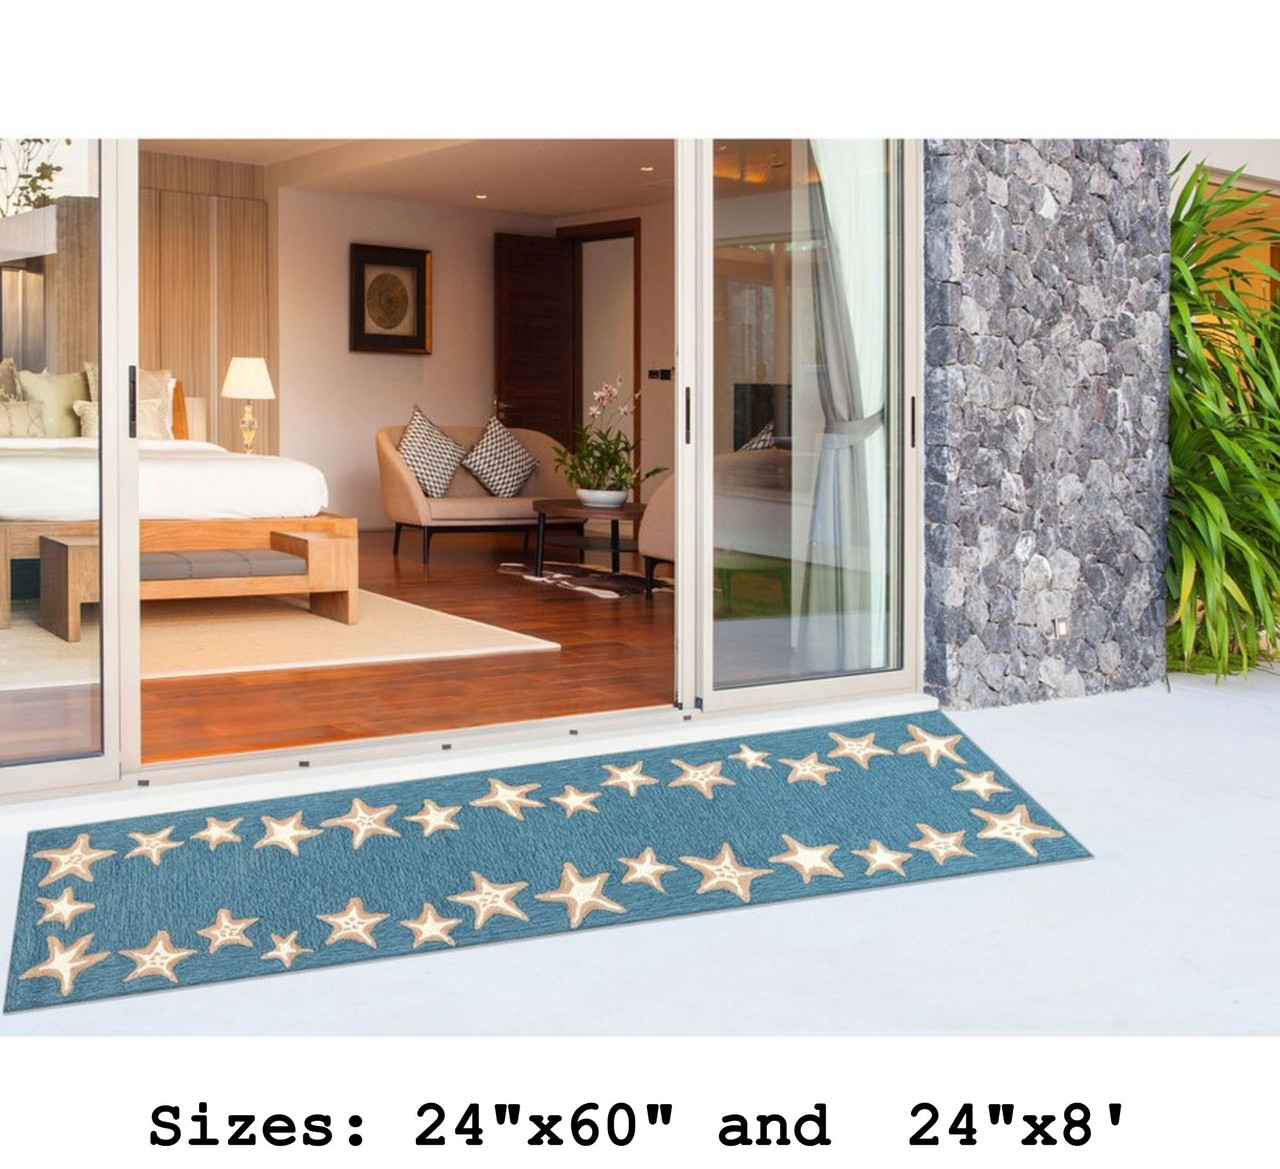 Aqua Capri Starfish Border Indoor/Outdoor Rug - Runner Lifestyle